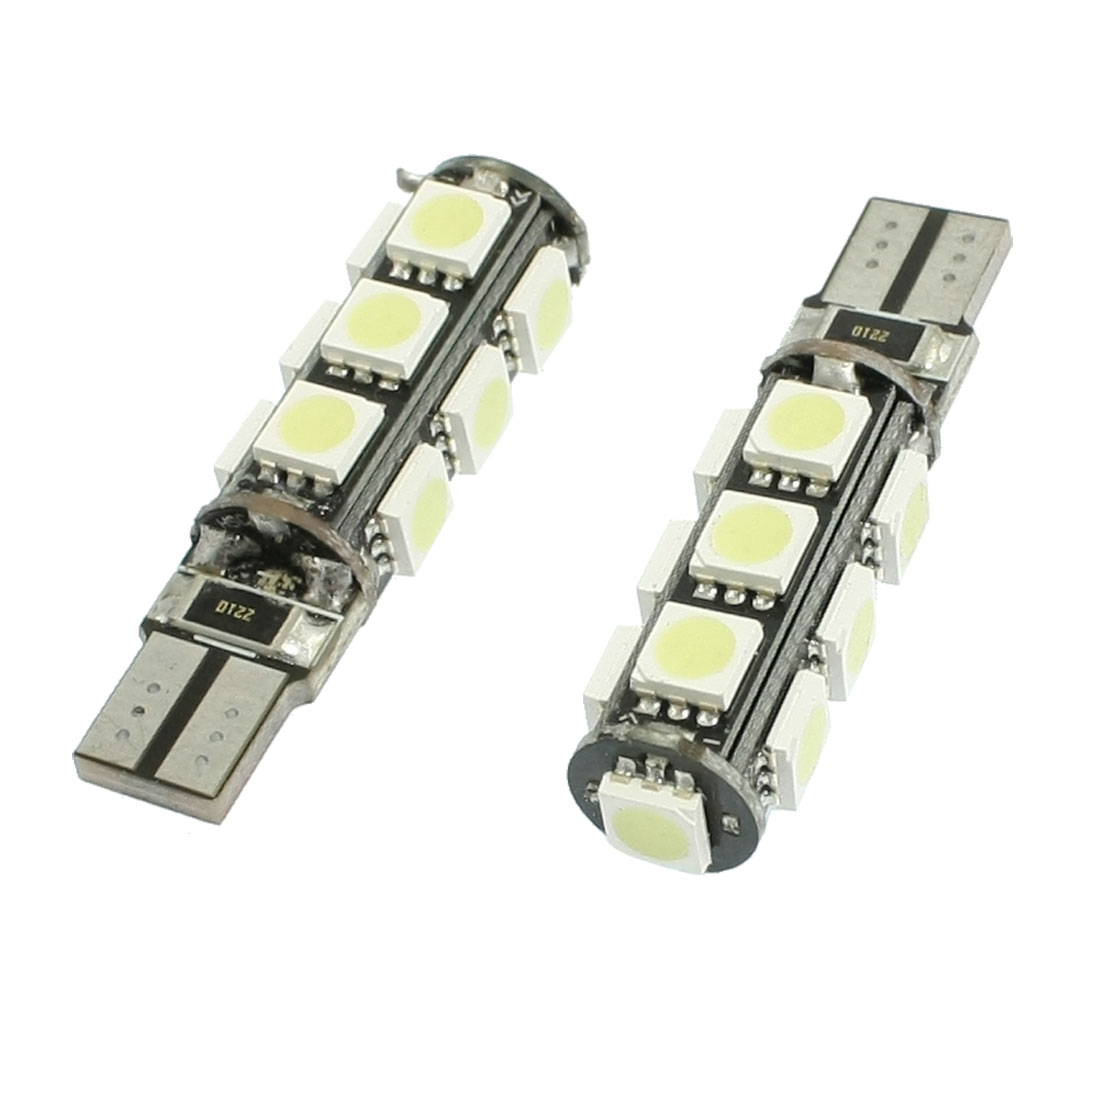 Unique Bargains 2 Pcs T10 White 5050 SMD 13 LED Wedge Turn Signal Light Bulb DC 12V